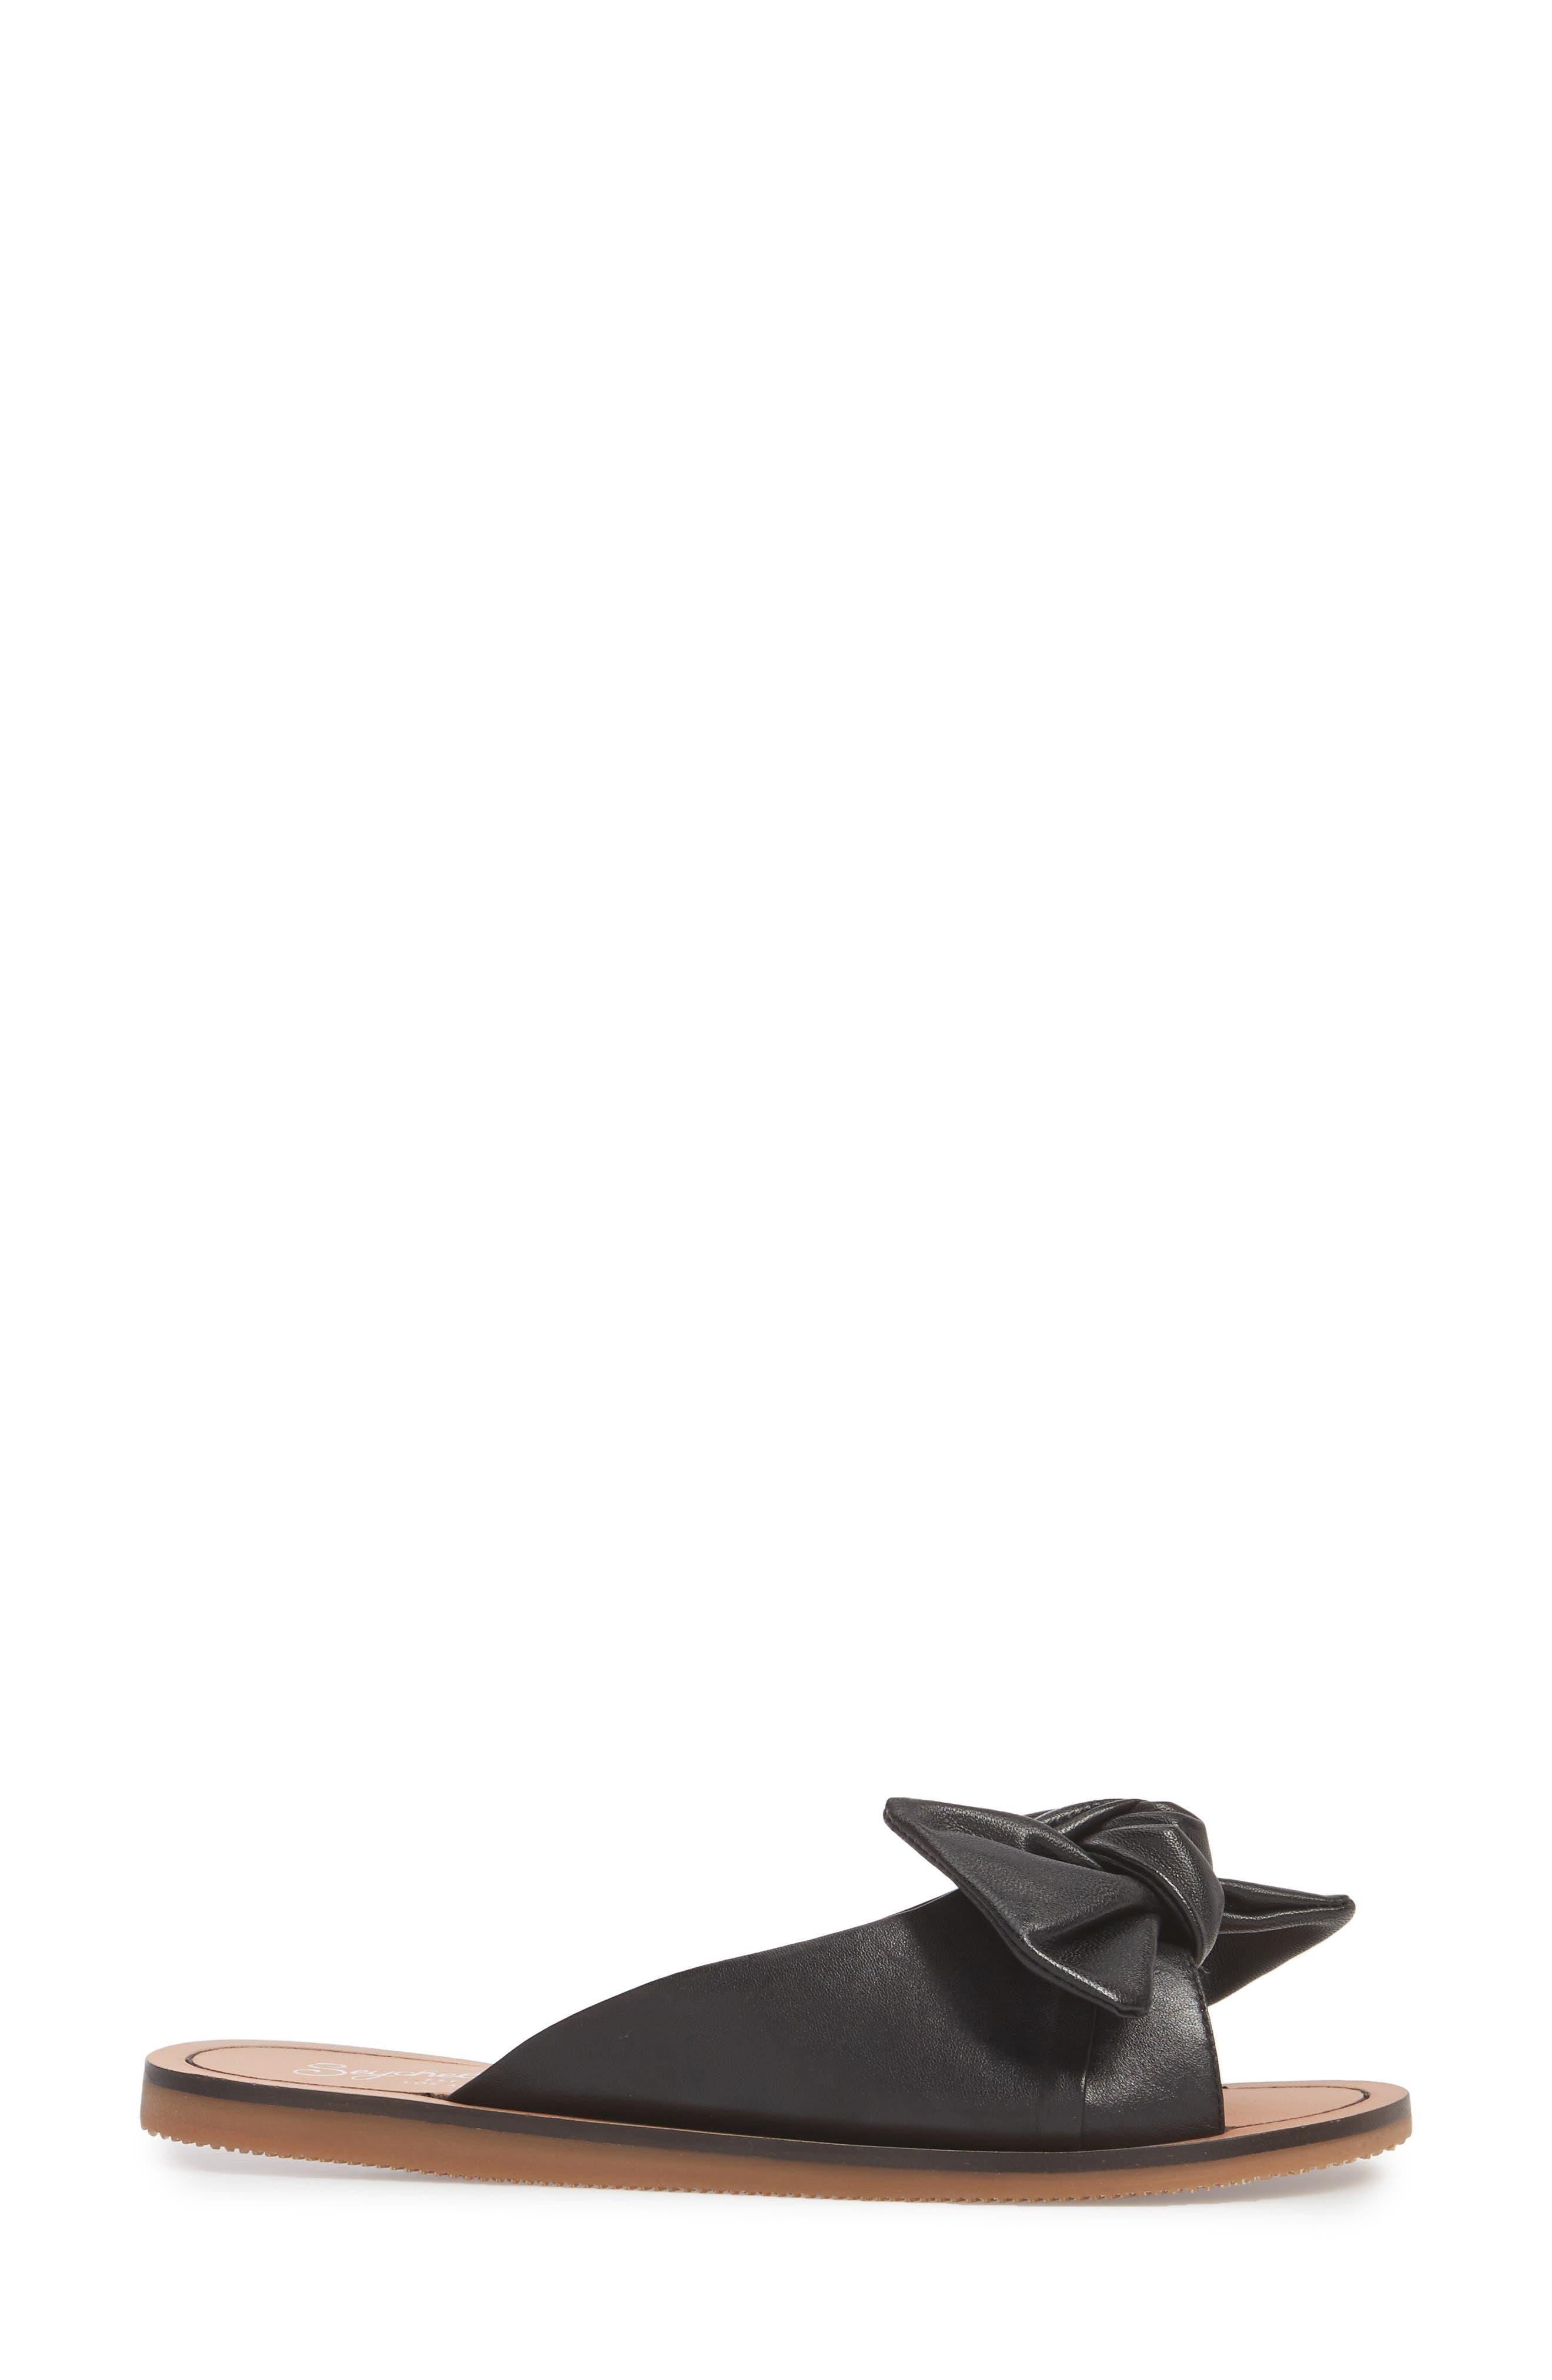 Childlike Enthusiam Slide Sandal,                             Alternate thumbnail 3, color,                             BLACK LEATHER